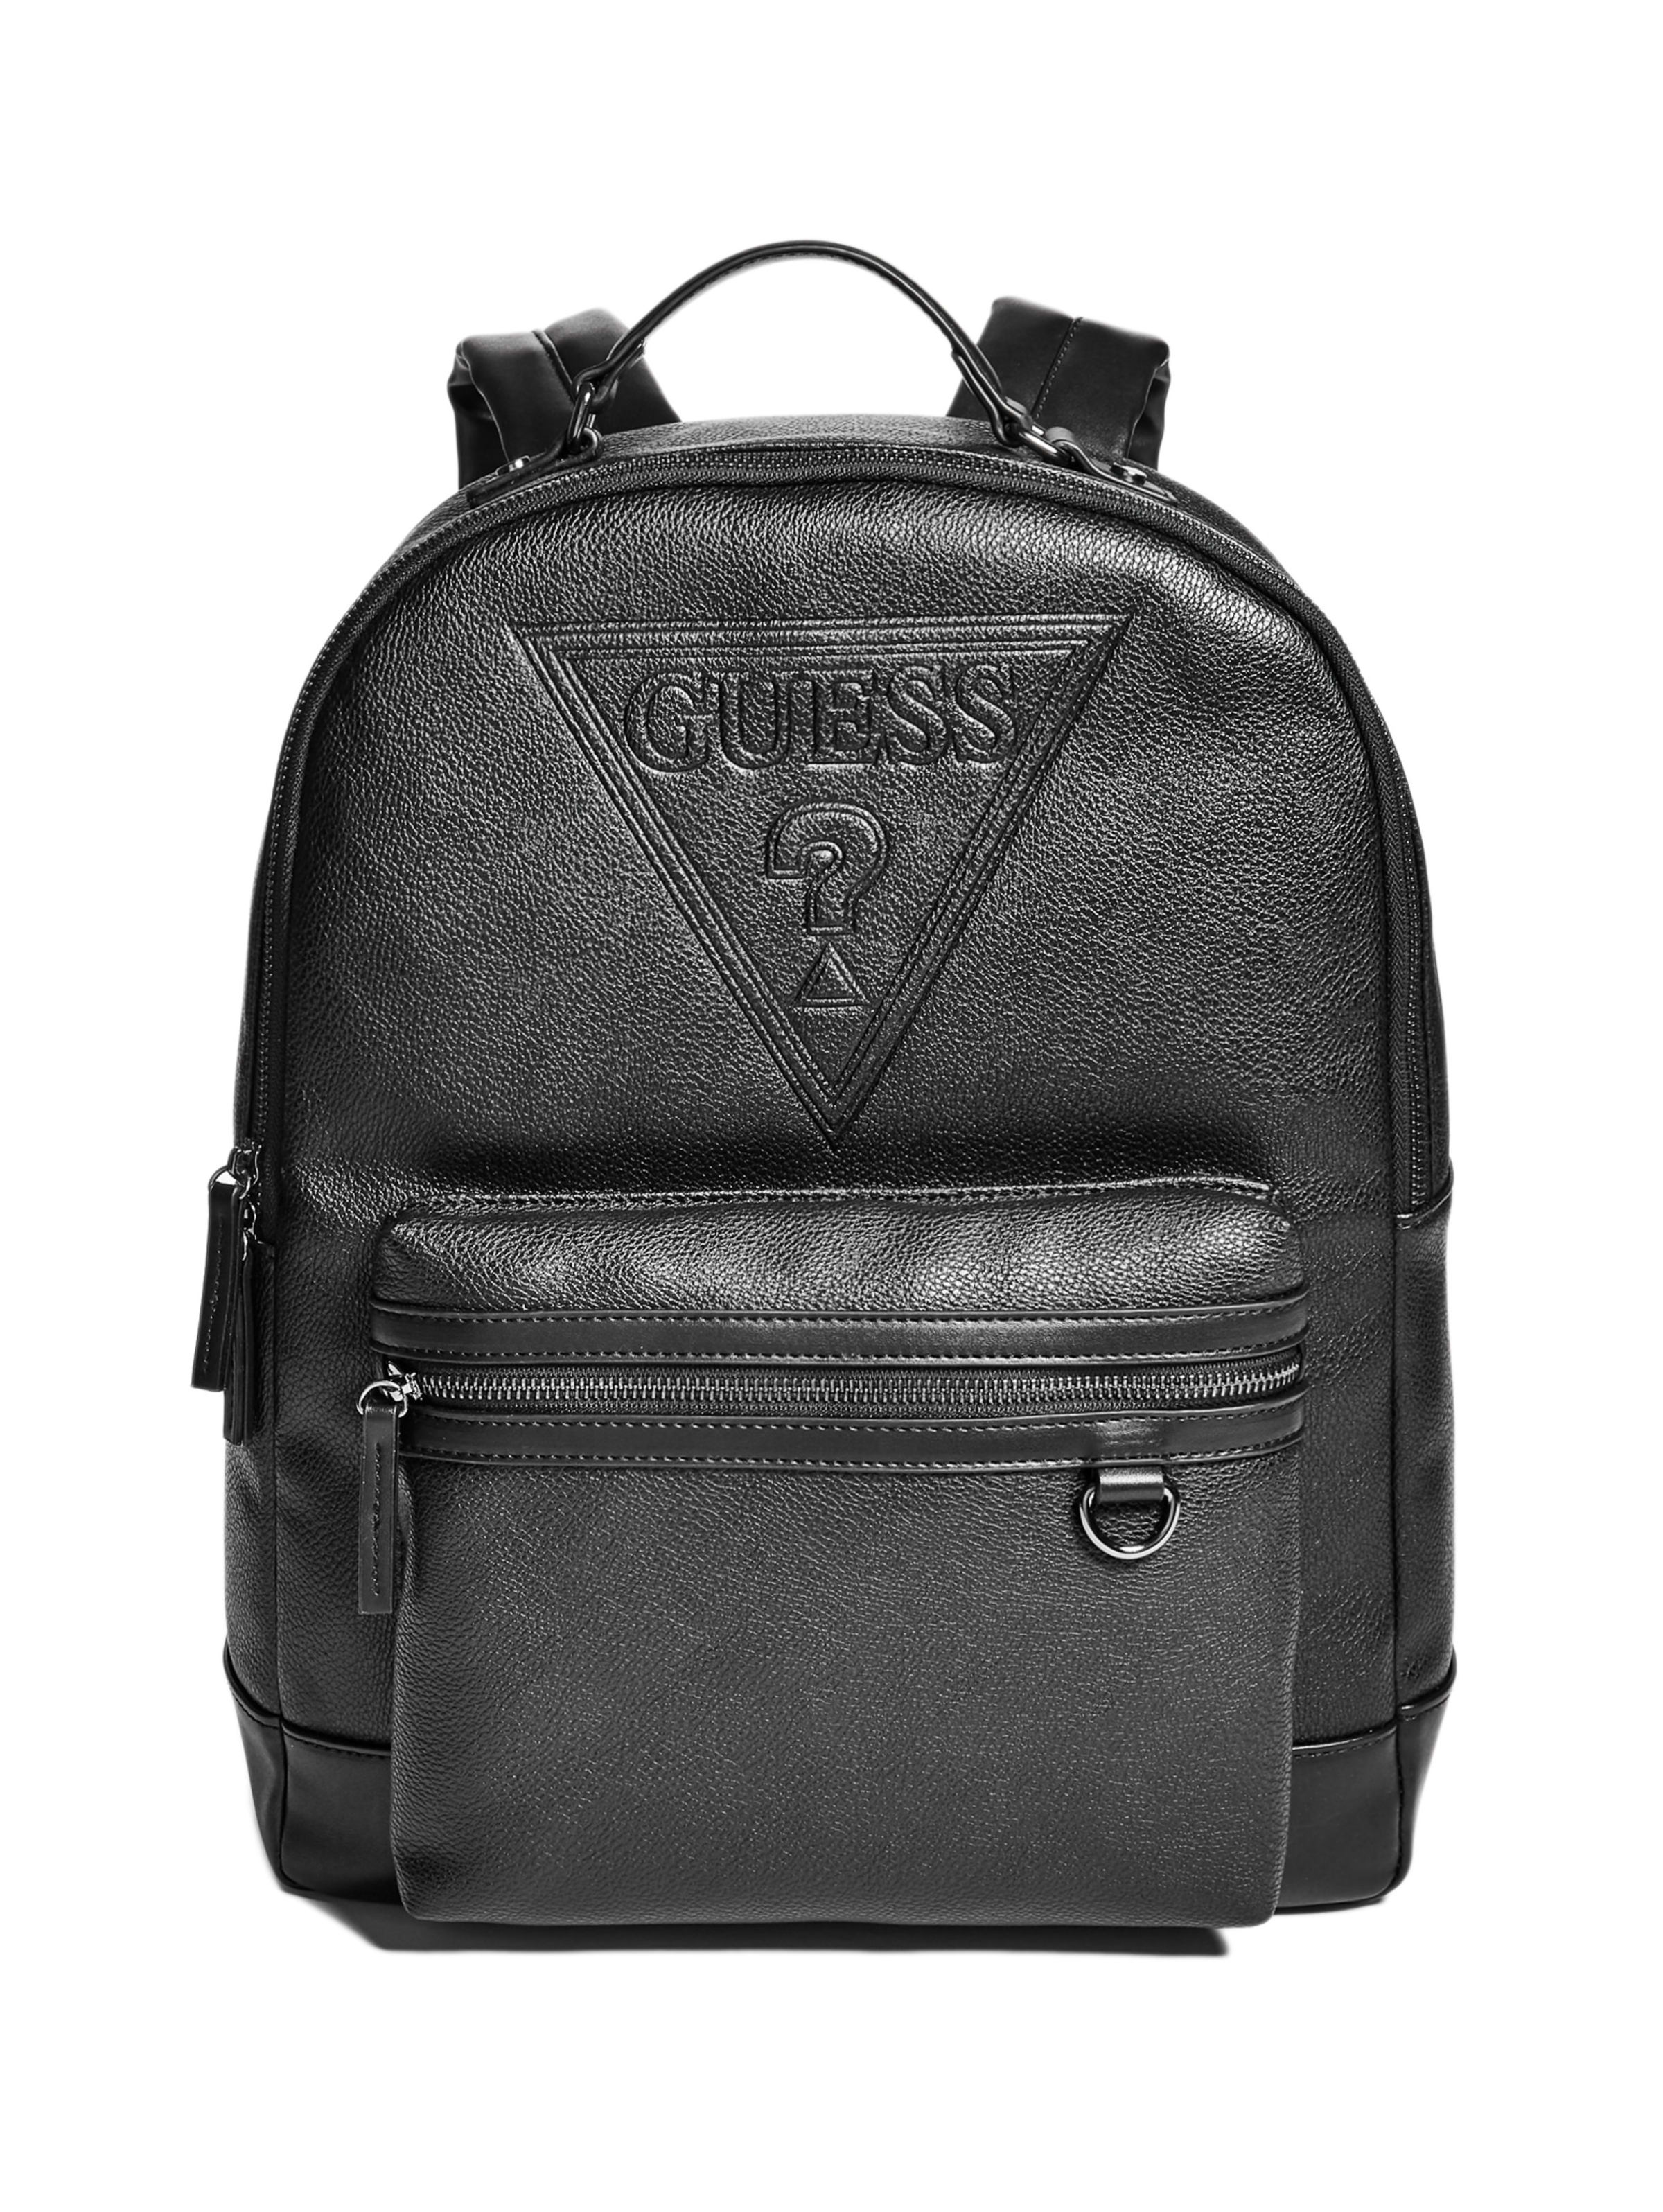 Guess Men's Backpacks: Shop Online Now | BUYMA